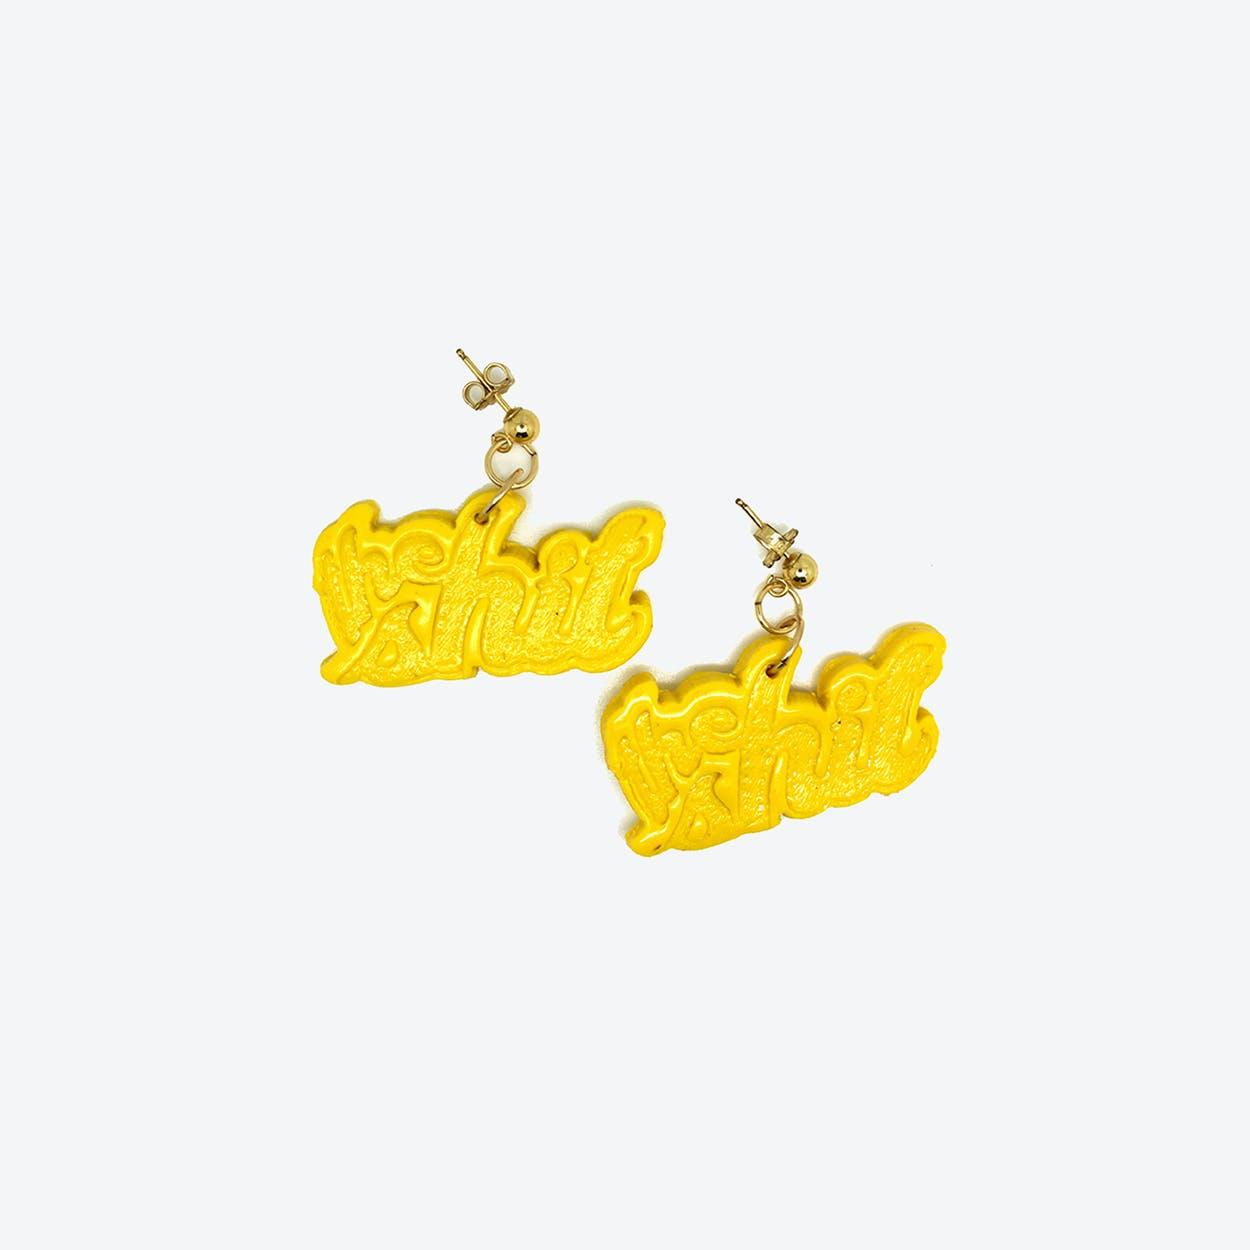 Humility Earrings - Yellow